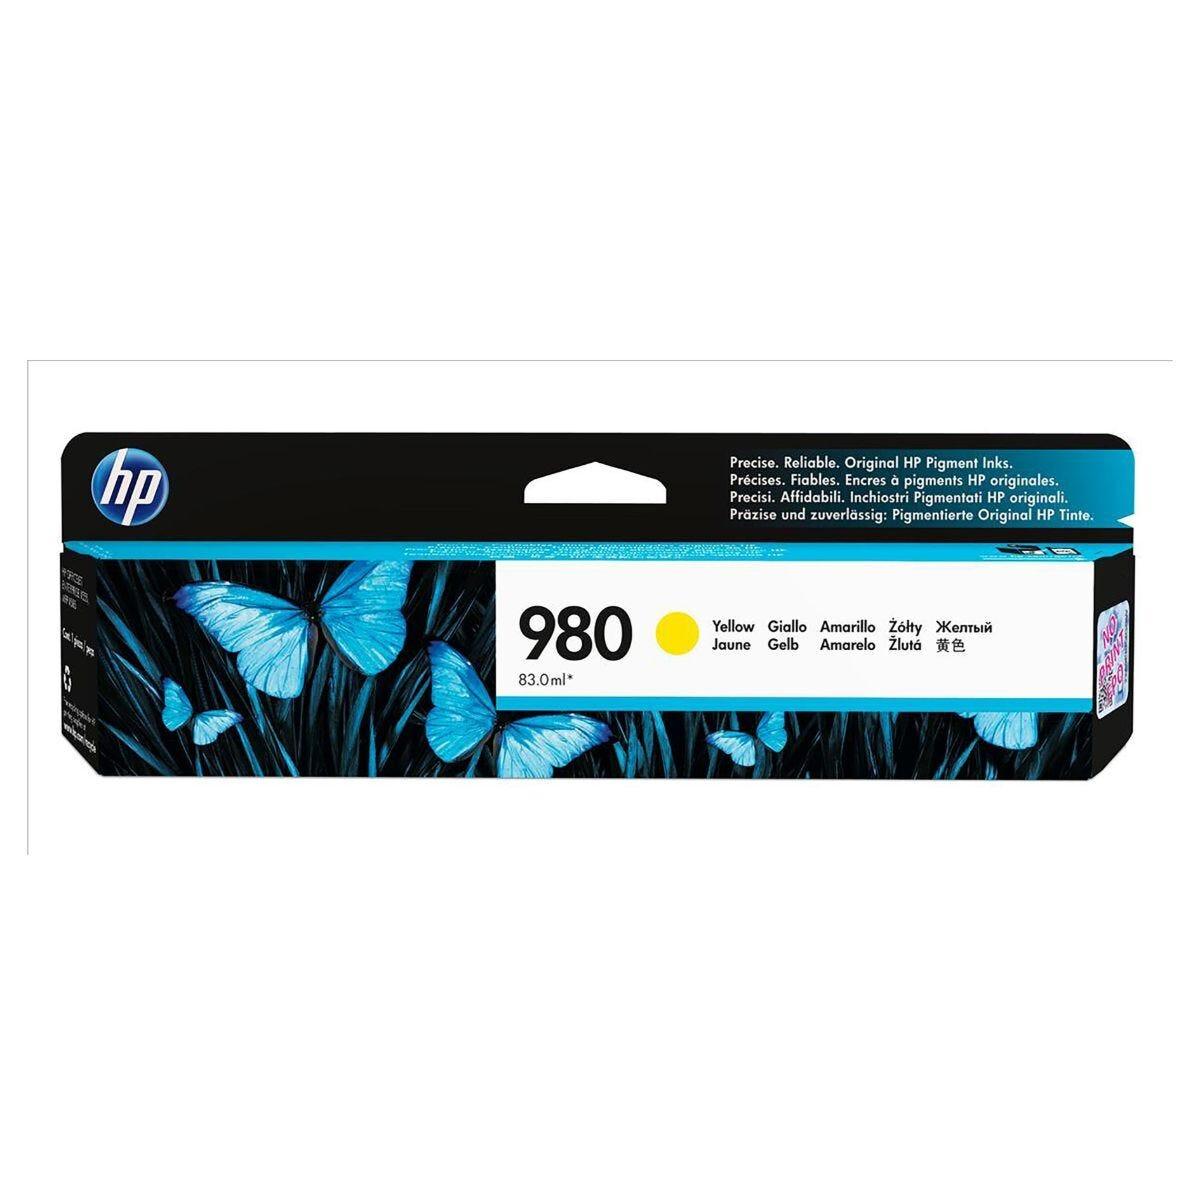 HP 980A Cartridge Toner Yellow